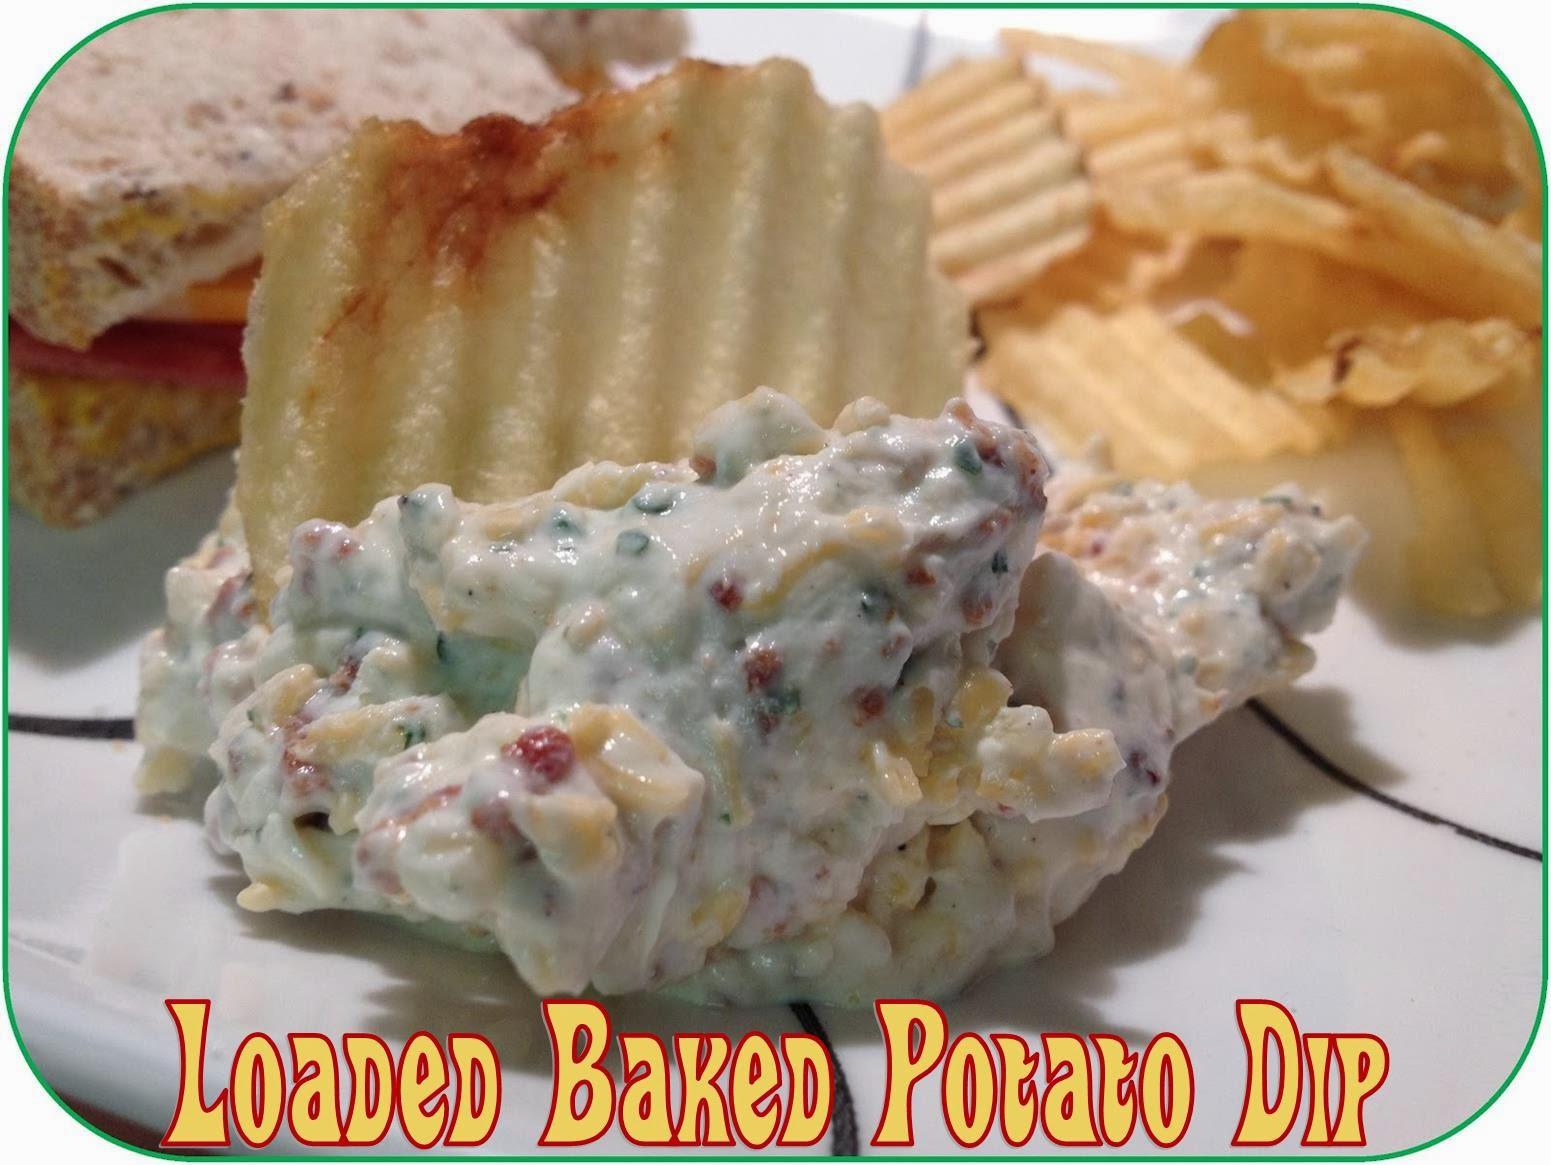 http://www.lifeinrandombits.com/2012/09/loaded-baked-potato-dip-recipe.html